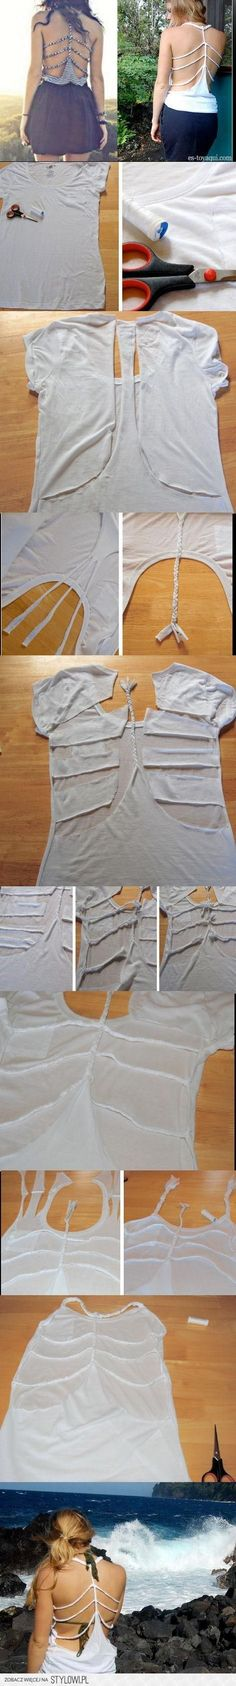 https://www.echopaul.com/ #diy DIY Clothes Refashion: DIY This would make a cool workout shirt